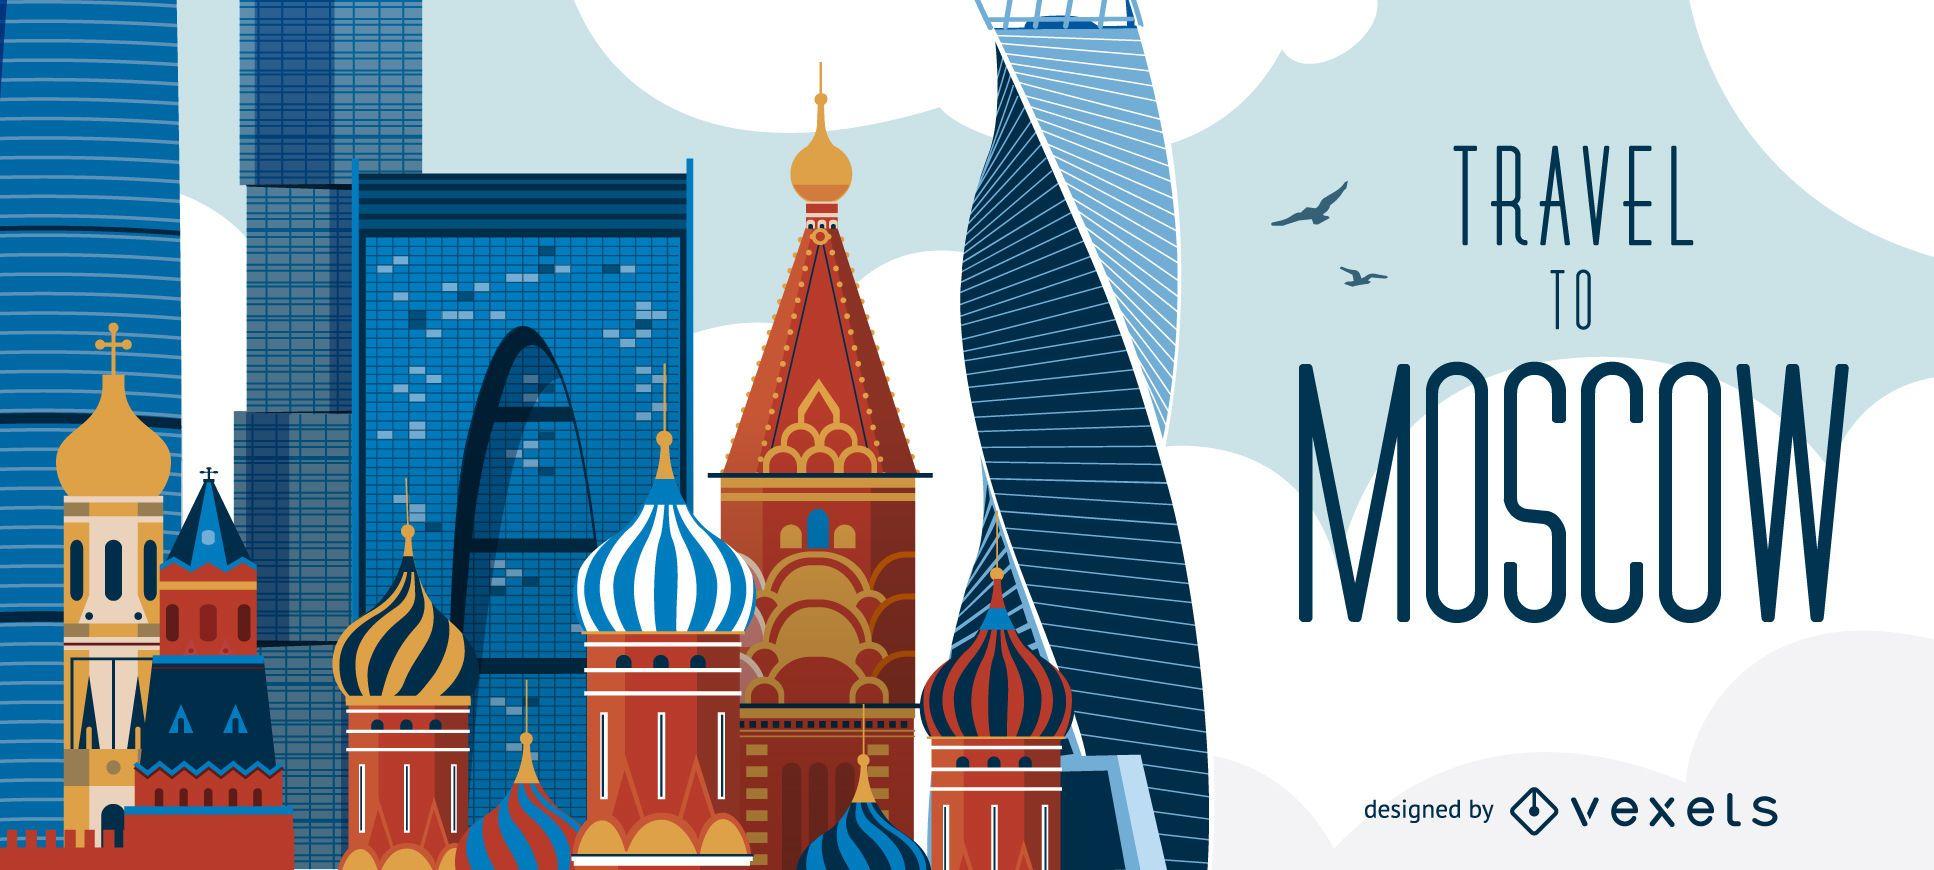 Viajar al horizonte de Moscú